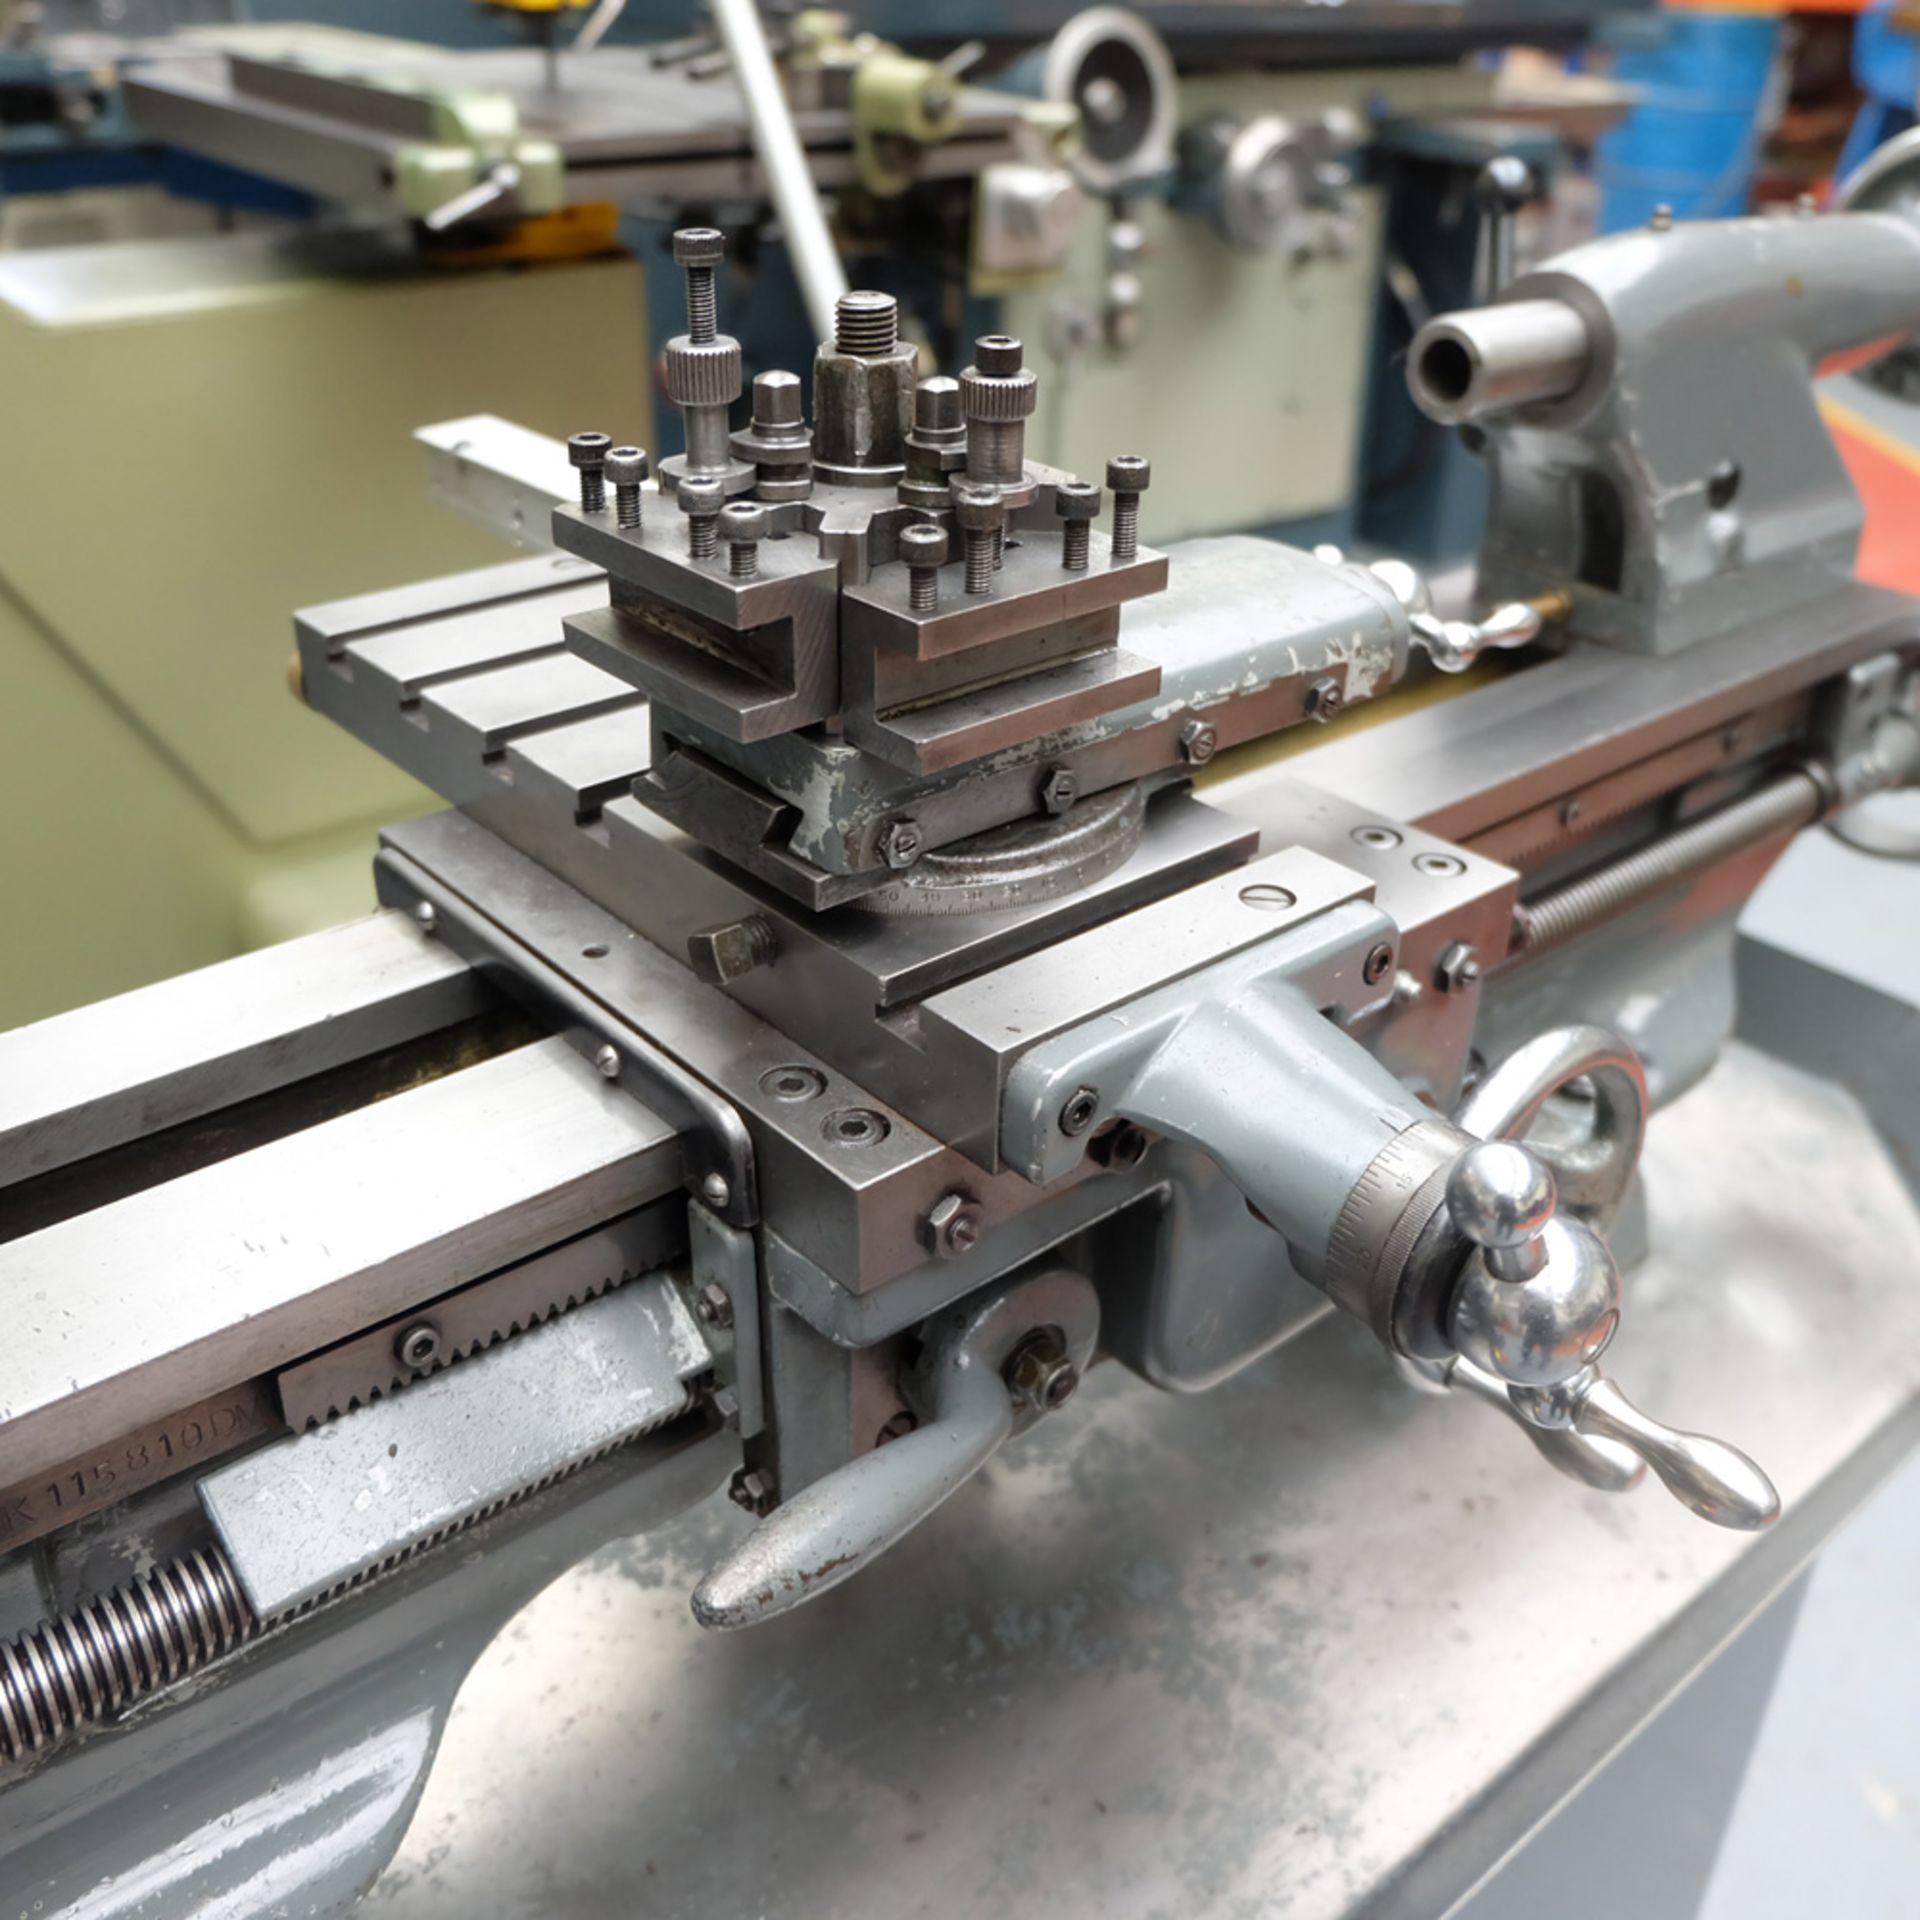 Myford Super 7 Model Makers Centre Lathe. - Image 7 of 17